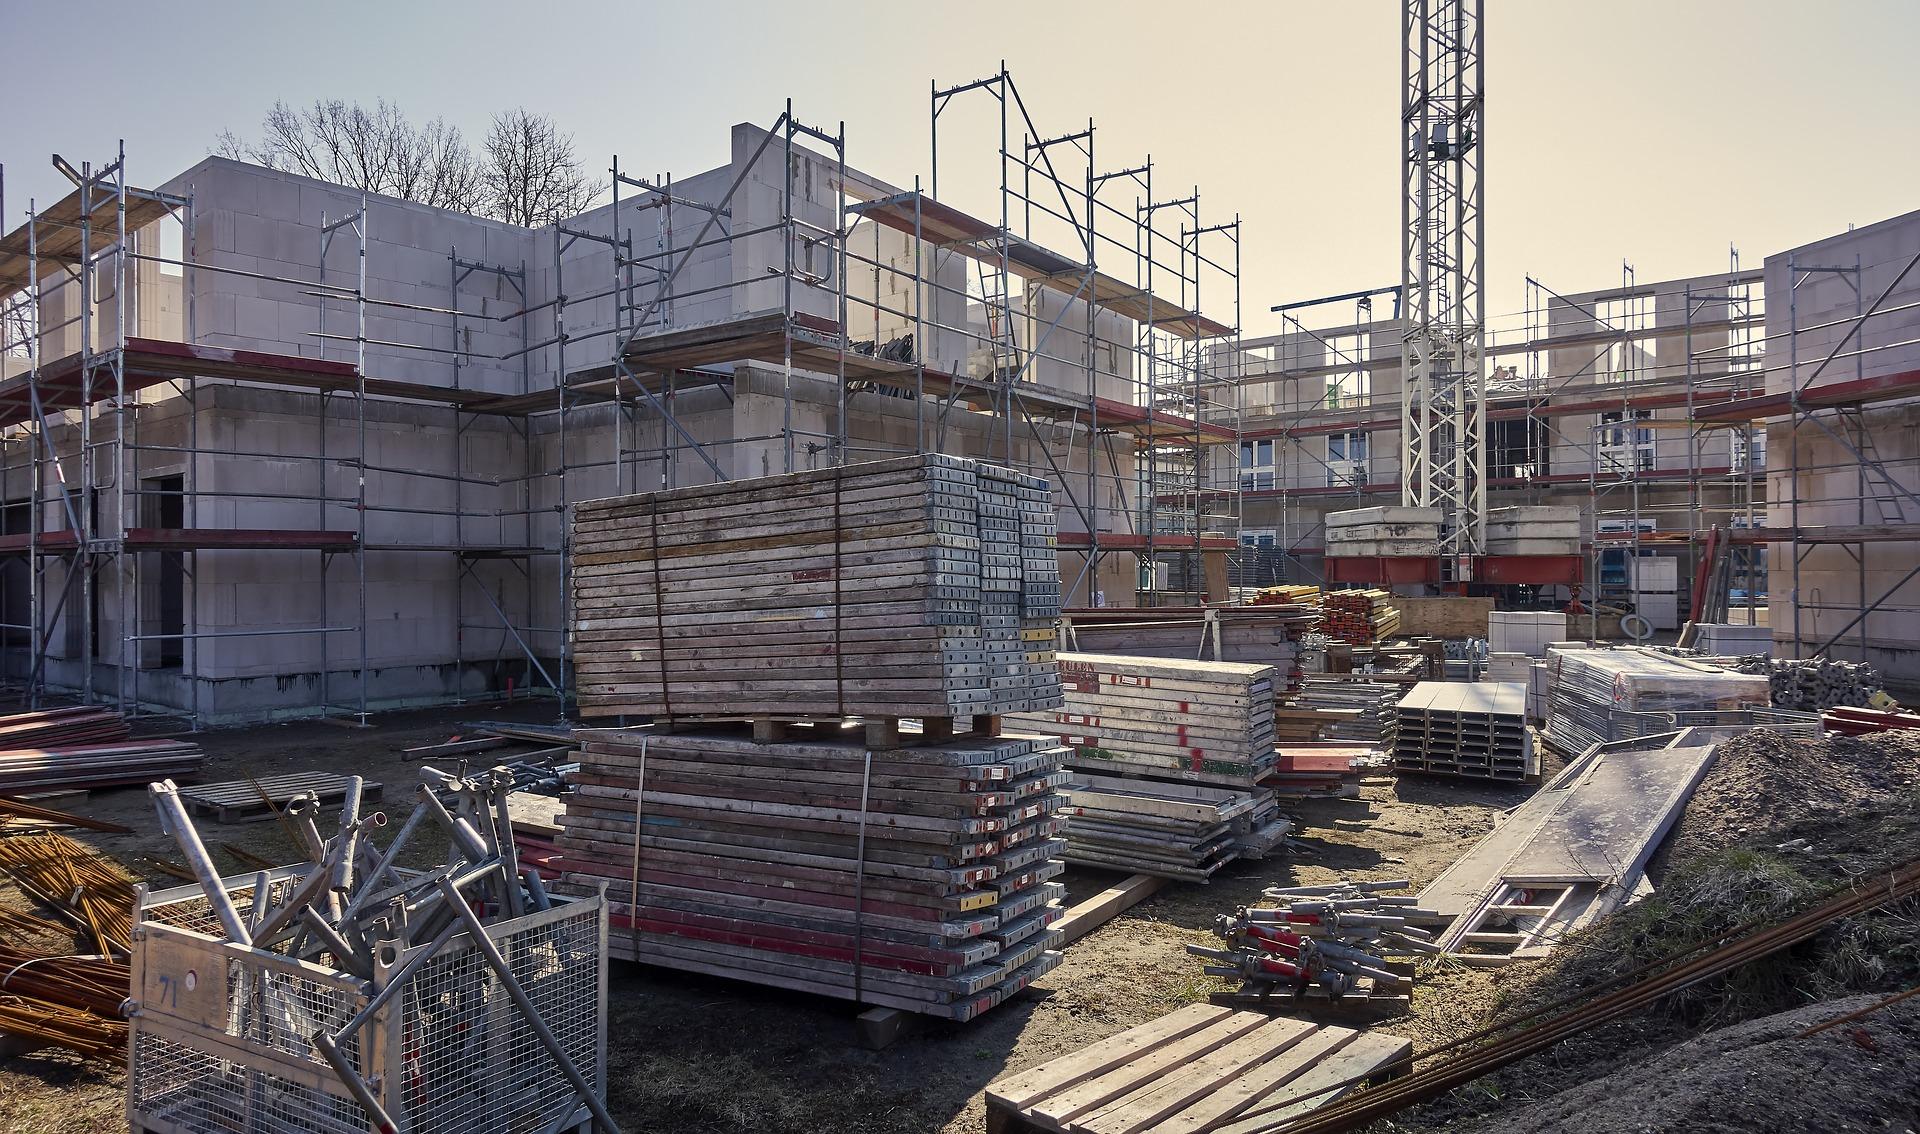 industrial-construction-site-electrician-btg